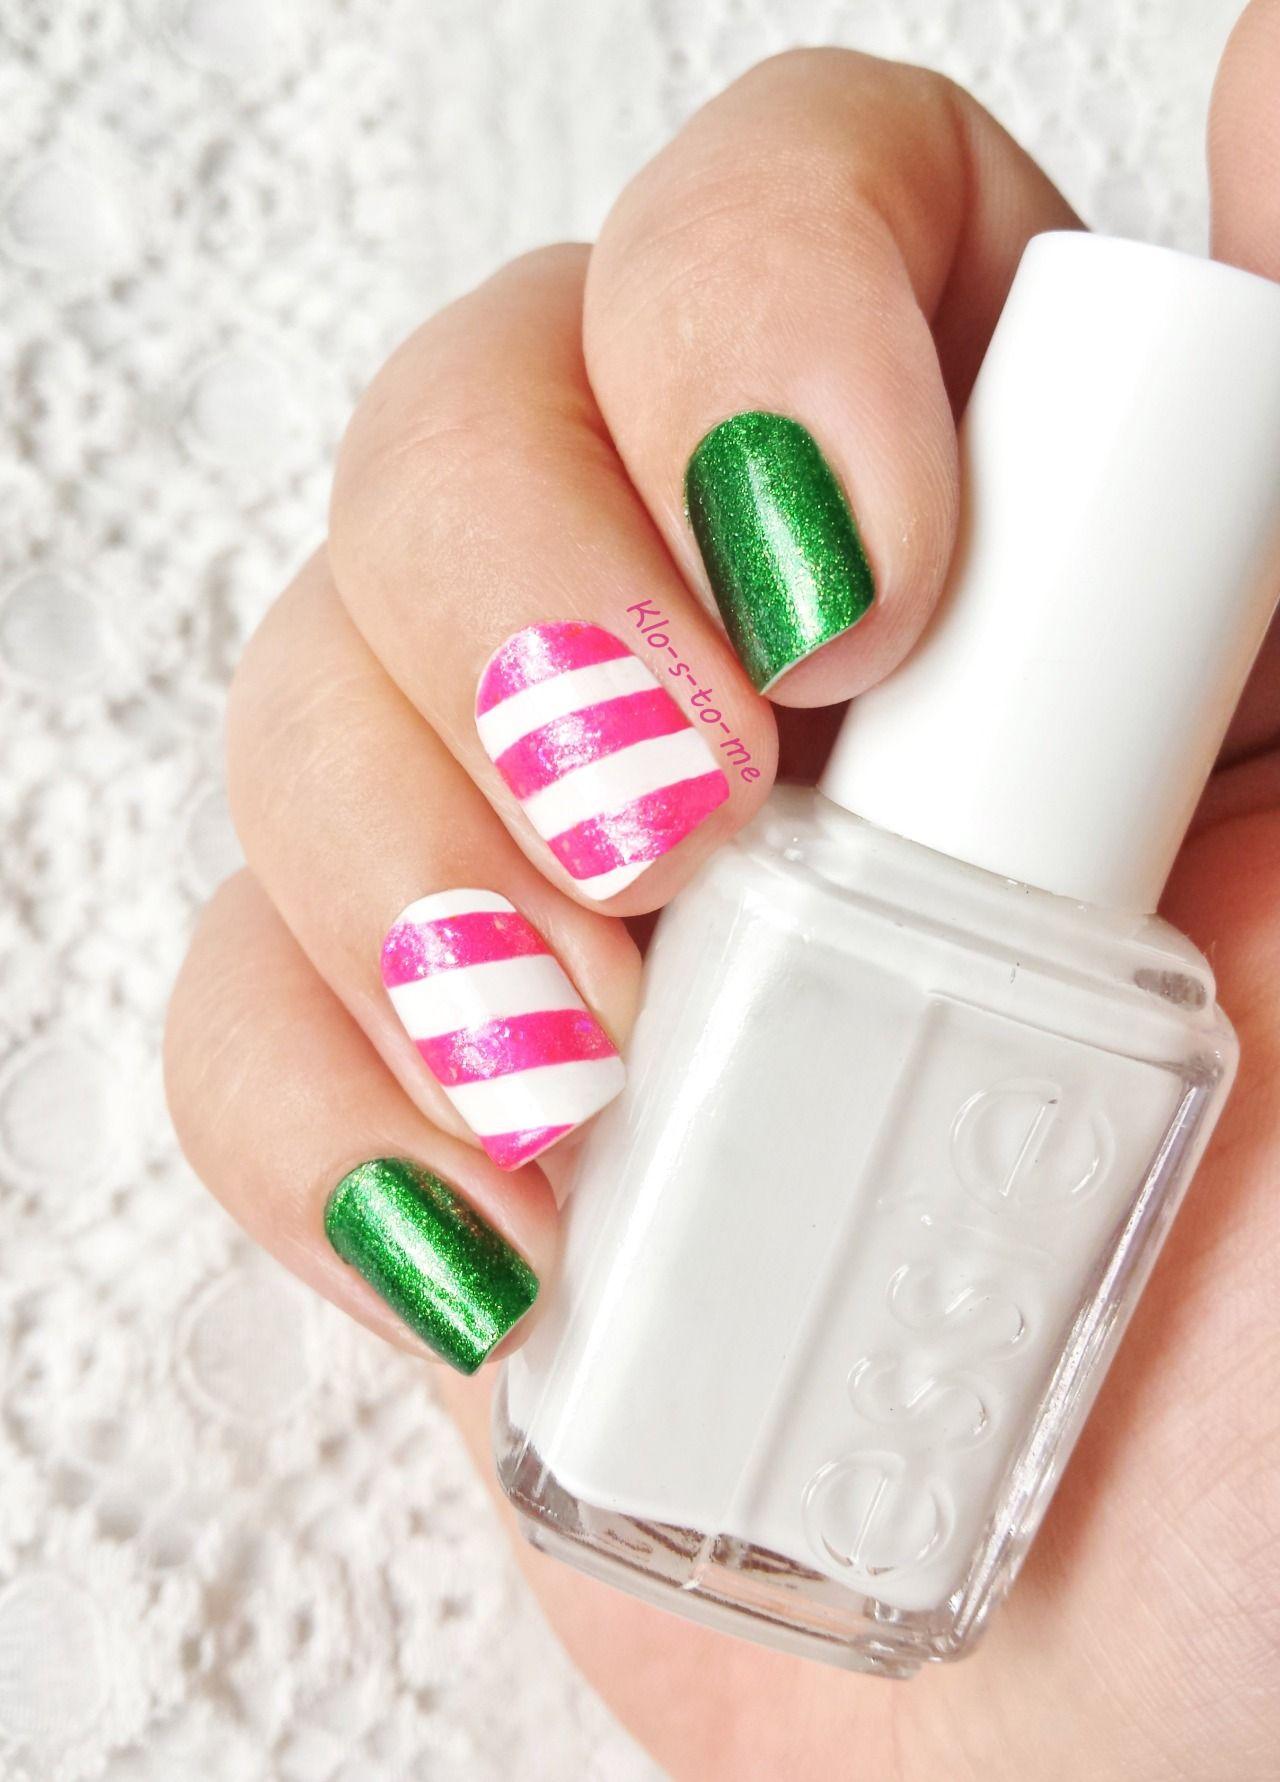 Holiday Candy Bourjois Club à Miami n°17 China Glaze : Pink Voltage n° 70291 Essie - Blanc Kiko n°533